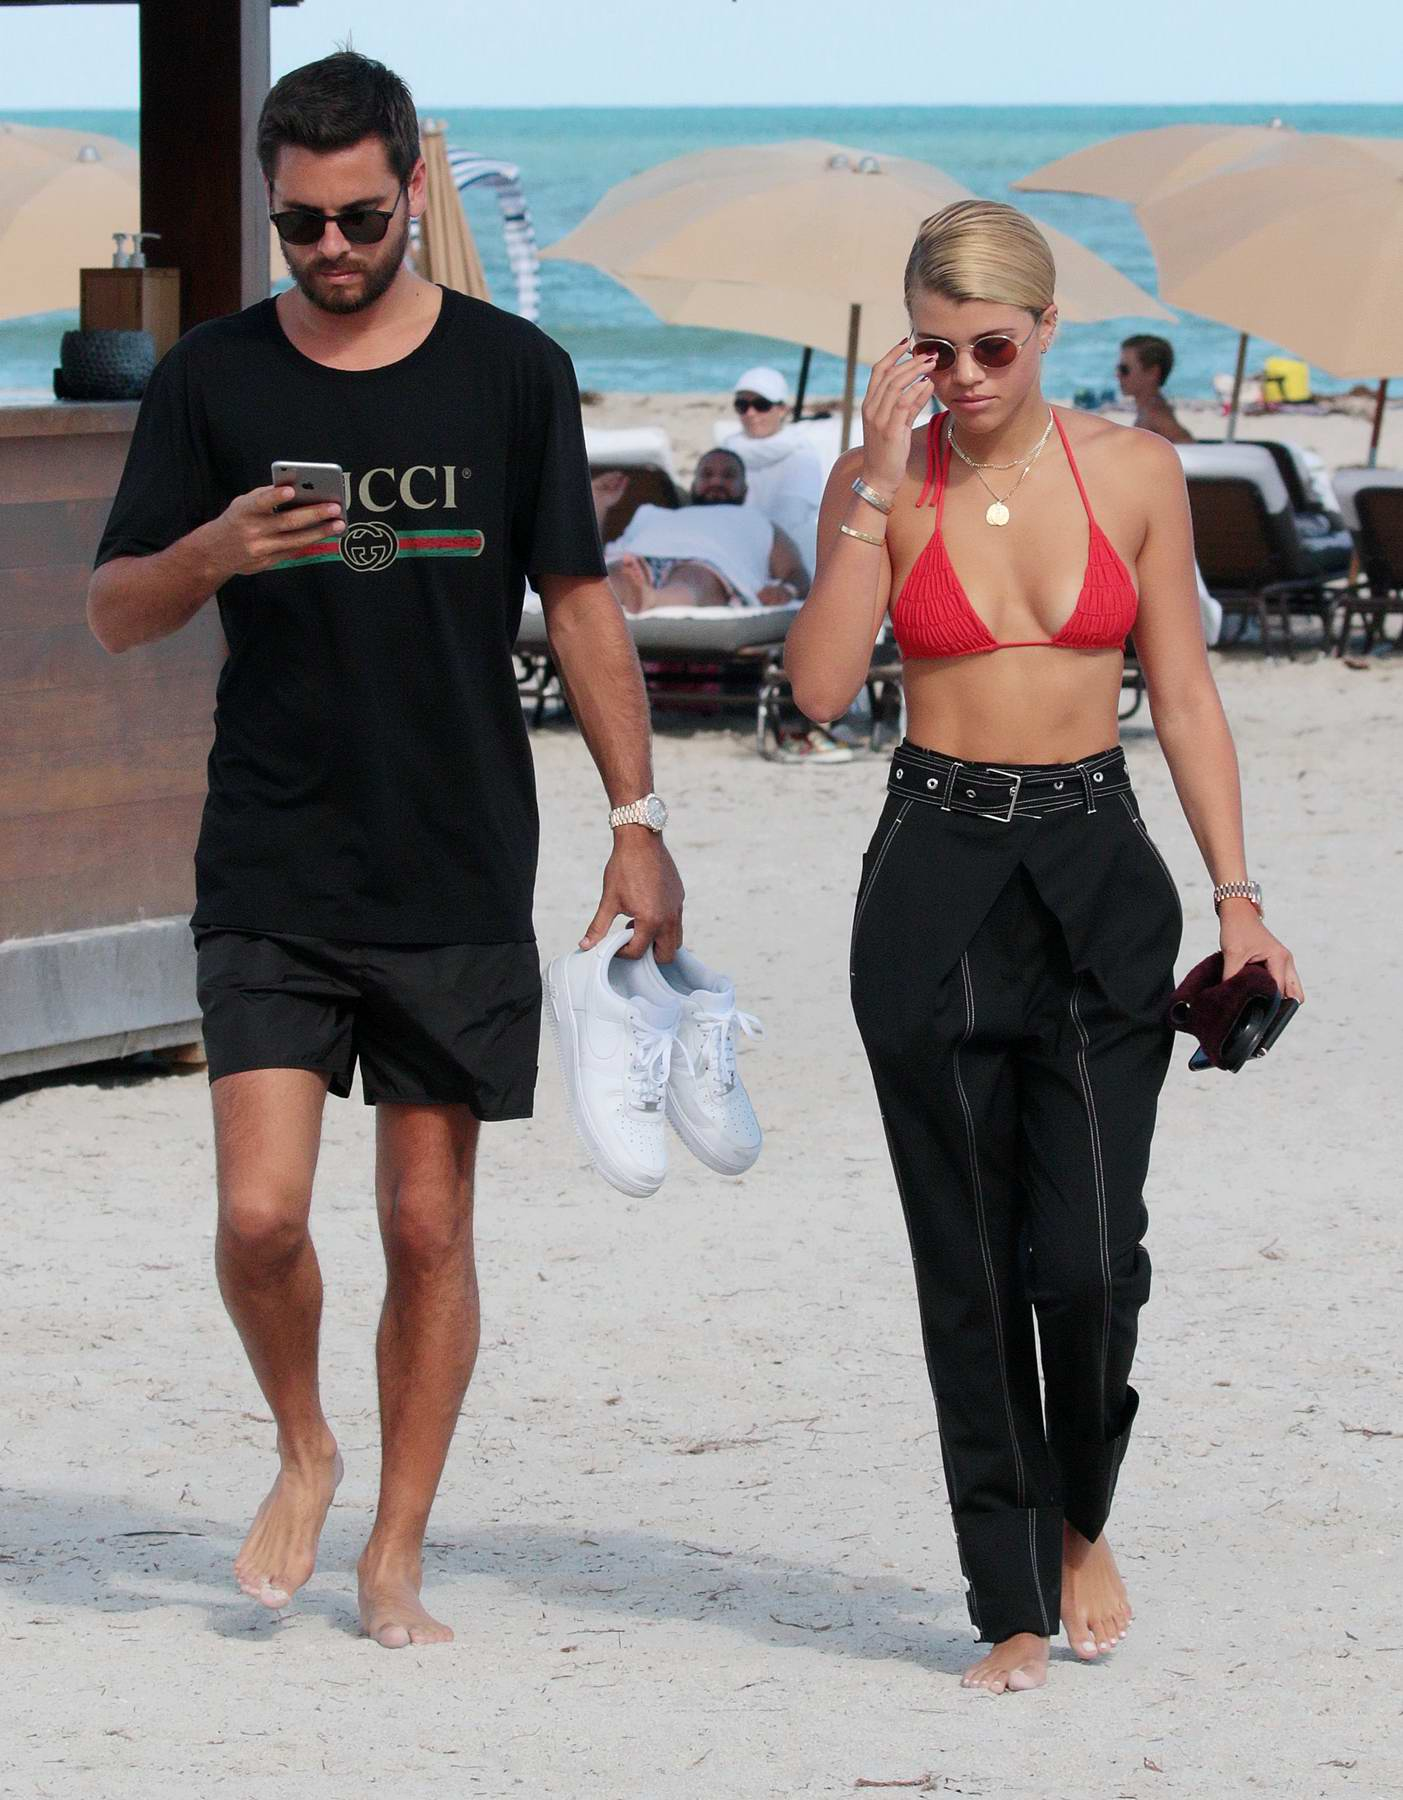 sofia richie in a red bikini top taking a walk with scott disick by the beach in miami-230917_#